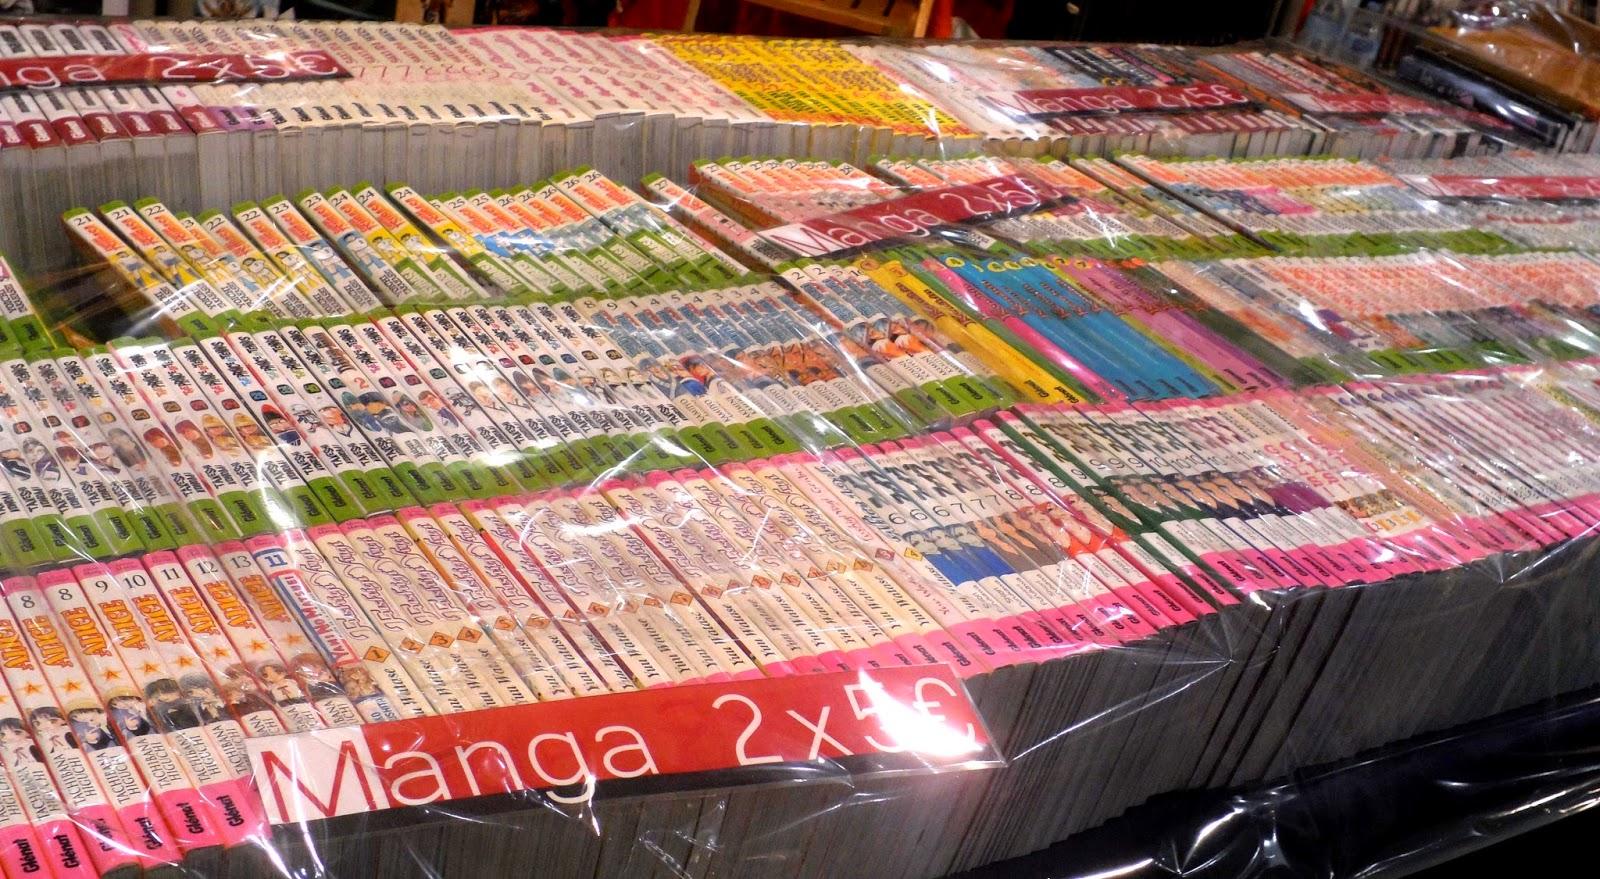 mangas expocomic 2014